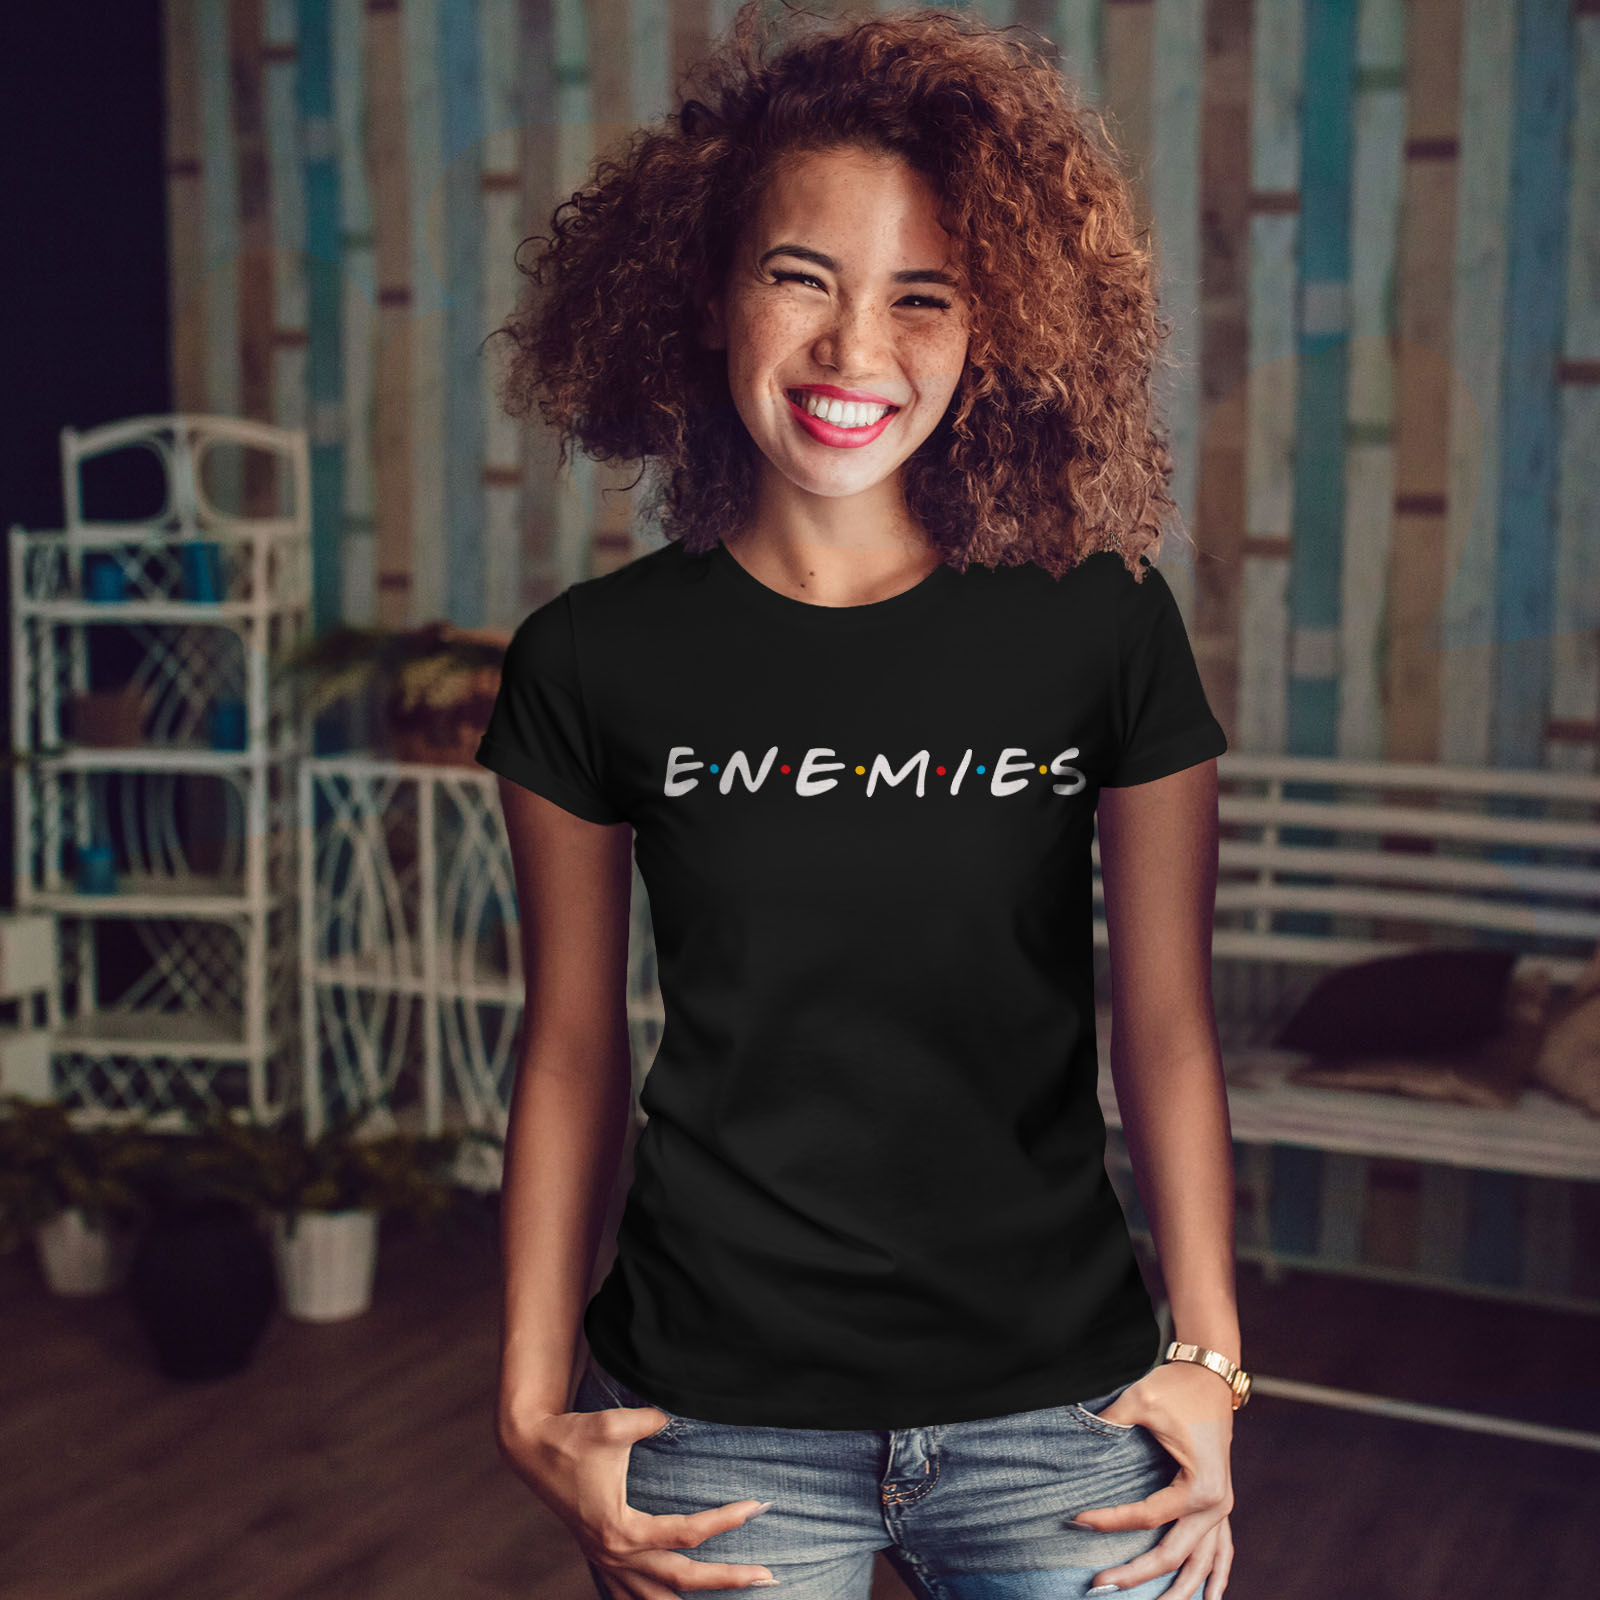 Wellcoda-Freunde-oder-Feinde-Damen-T-Shirt-Serie-Casual-Design-Printed-Tee Indexbild 4